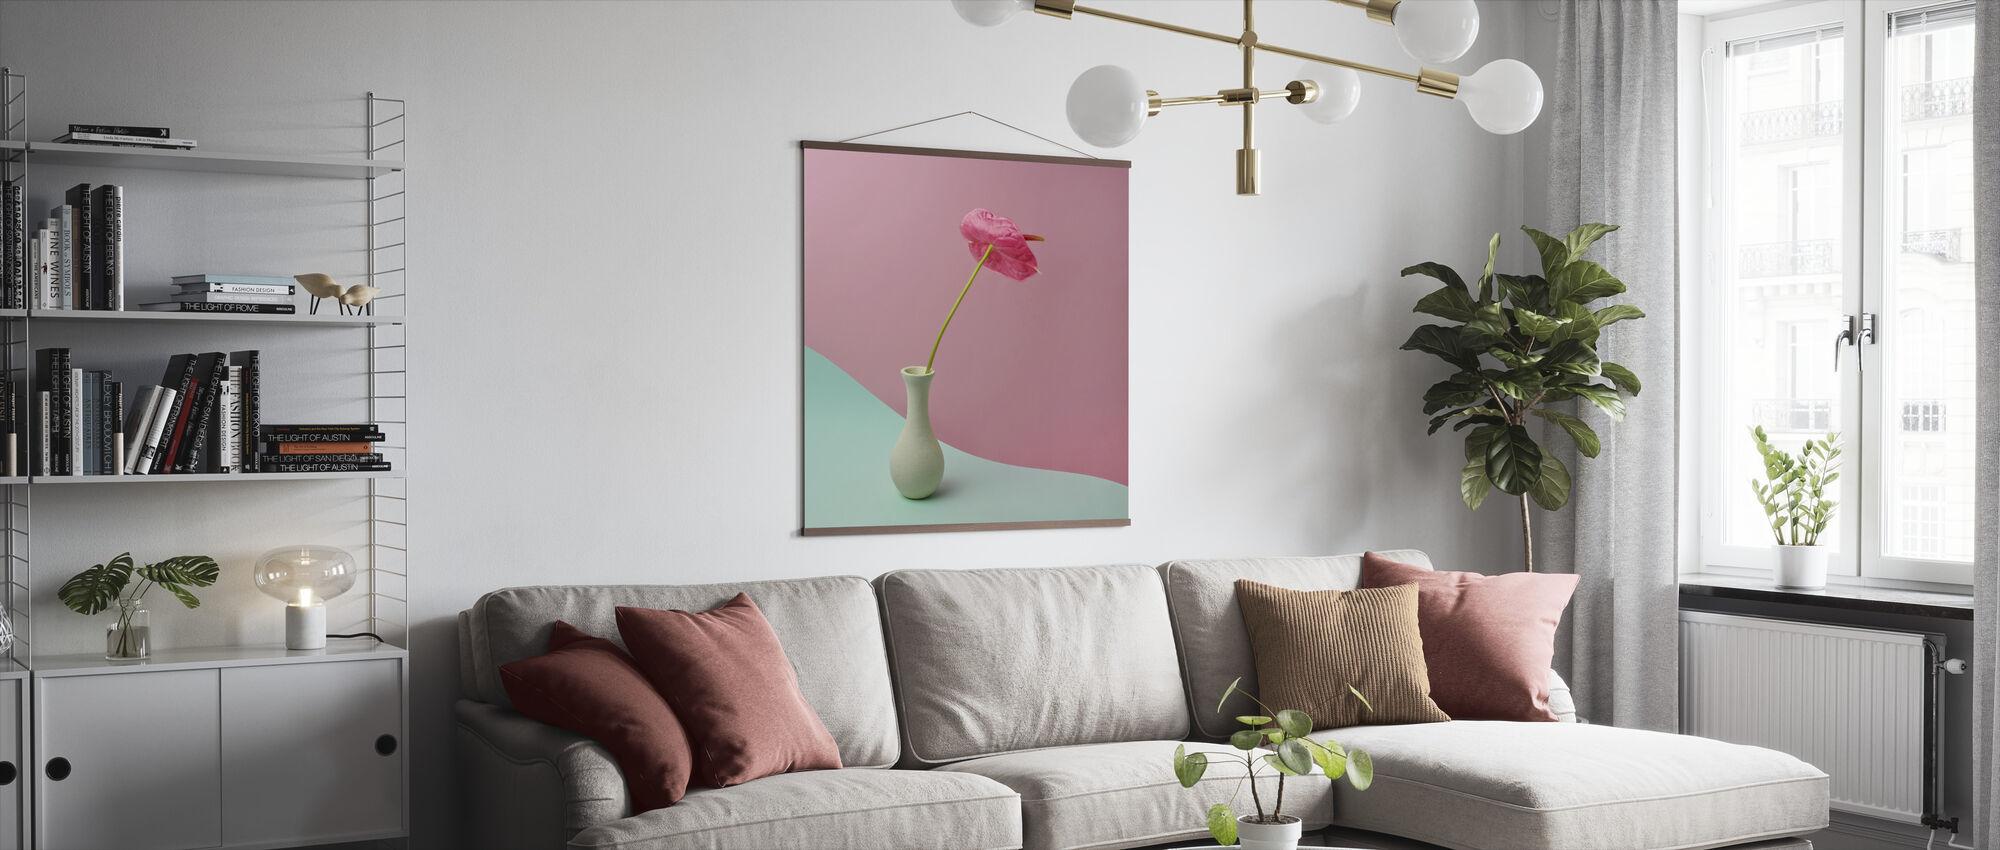 Anthurium in White Vase - Poster - Living Room